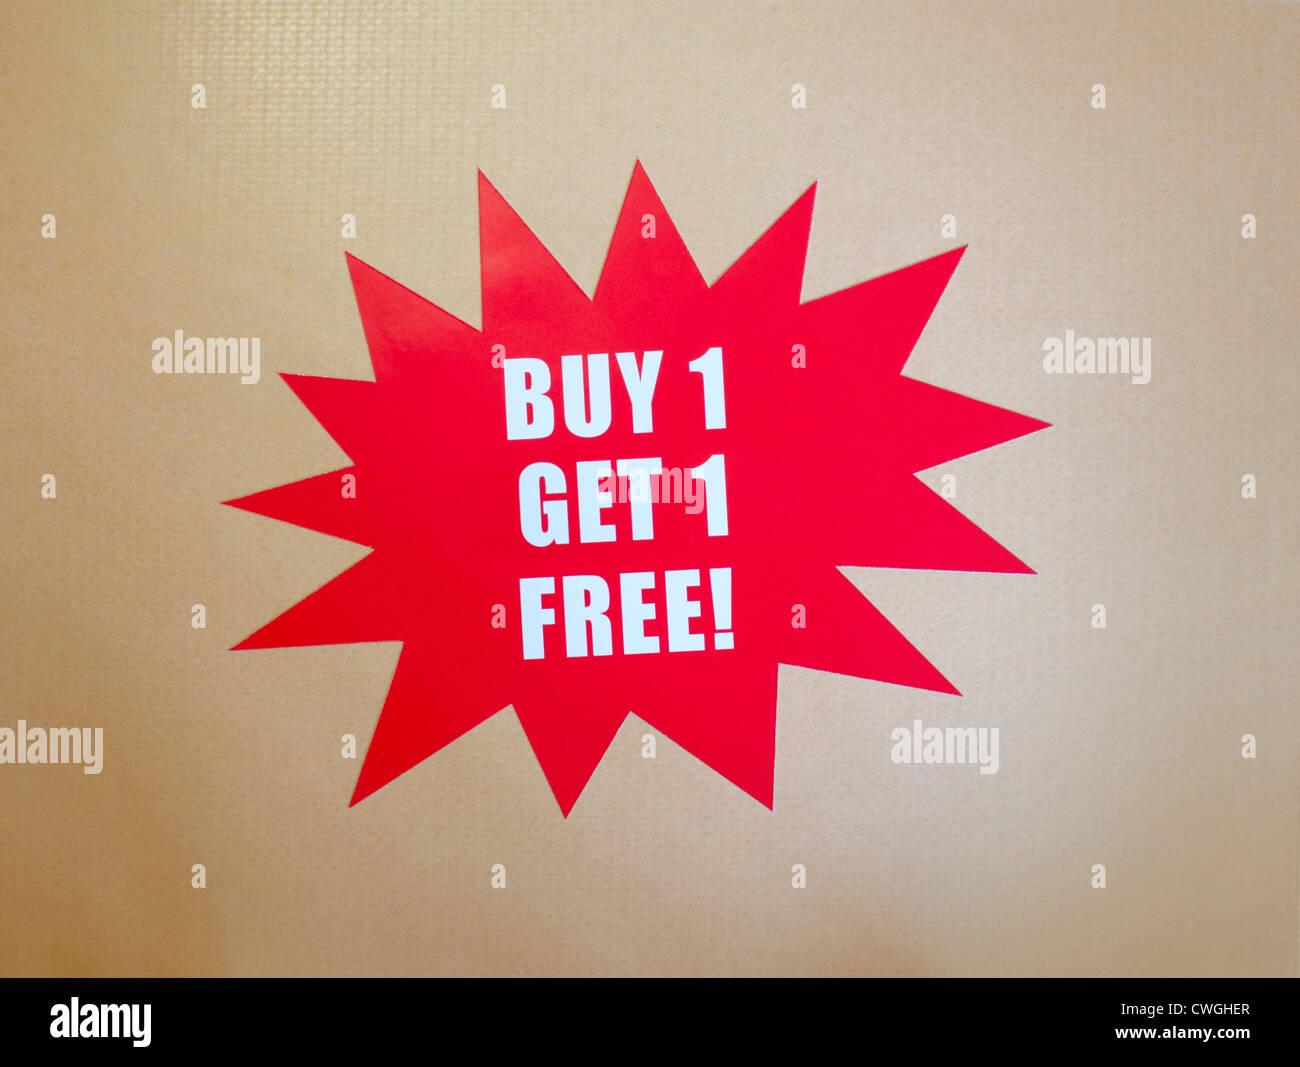 Buy one get one free Stock Photo: 50152111 - Alamy